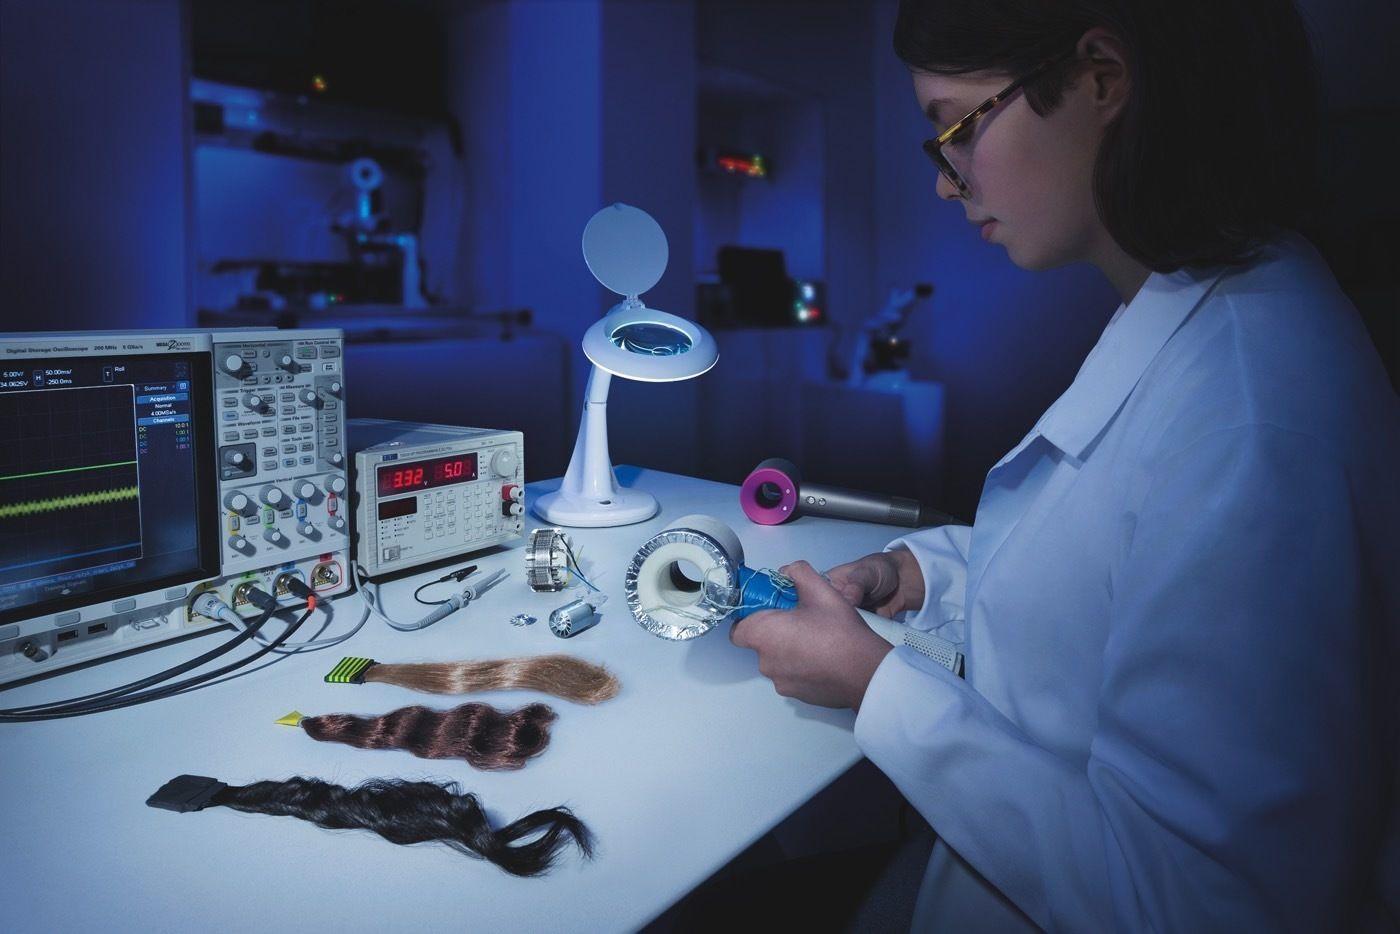 Dyson-Supersonic-hair-dryer-lab.jpg